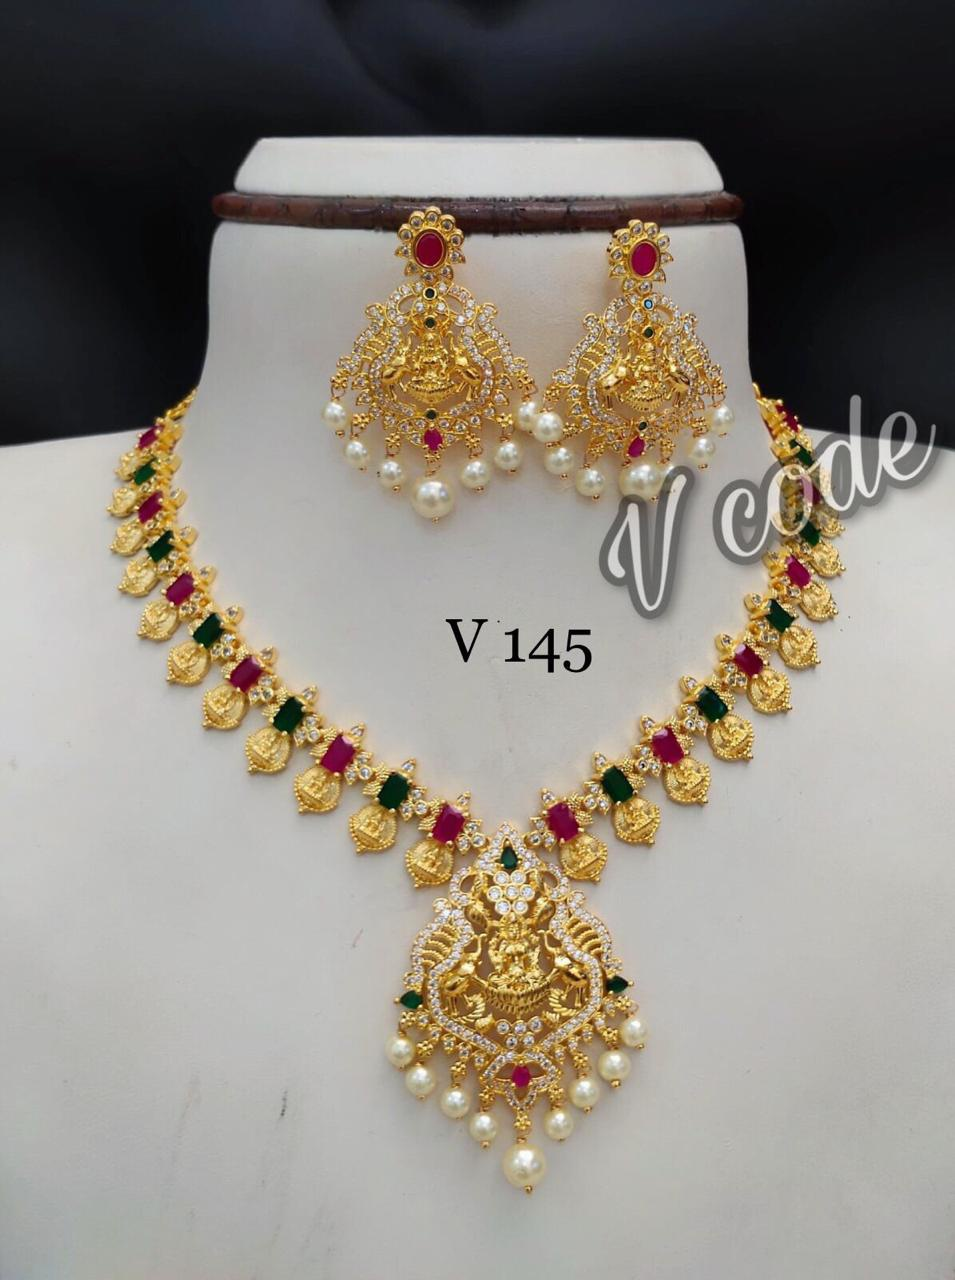 Gorgeous one gram gold  Lakshmi kasu necklace with chaadnbalis. one gram jewellery designs 1 gram gold jewellery in begum bazar one gram gold ornaments